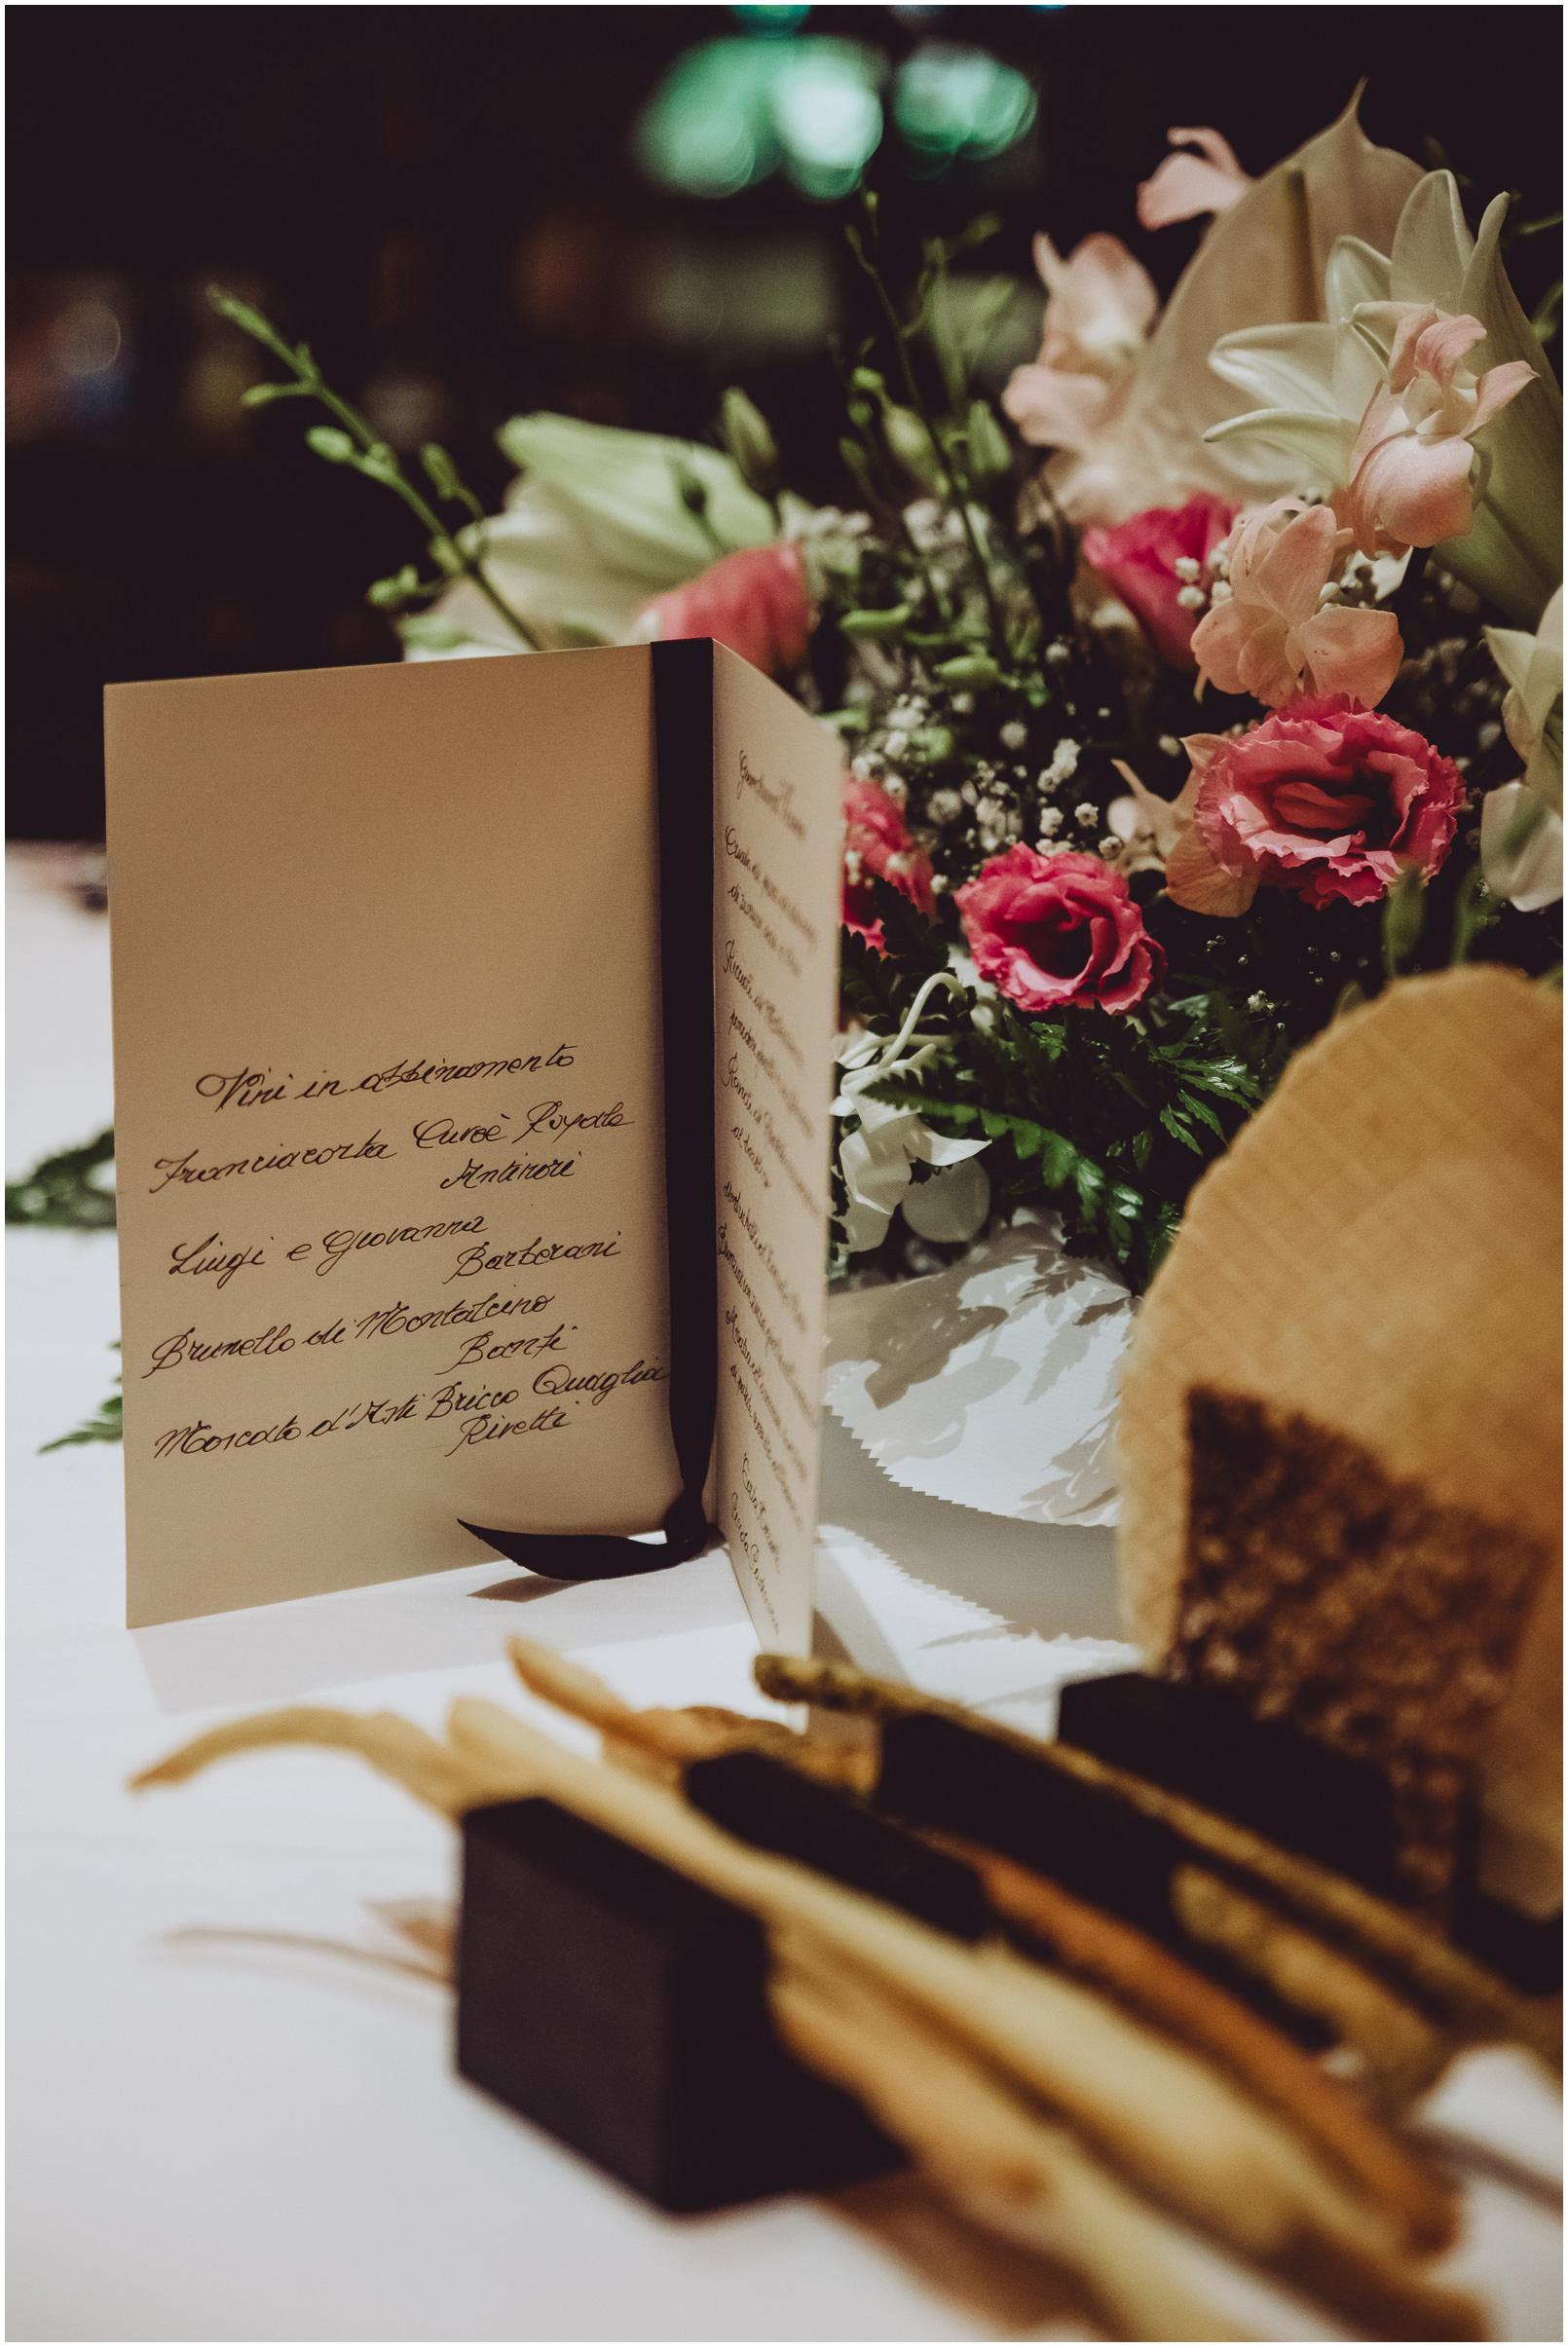 WEDDING-PHOTOGRAPHY-SARA-LORENZONI-FOTOGRAFIA-MATRIMONIO-ORVIETO-JUKA-ANTONELLO49